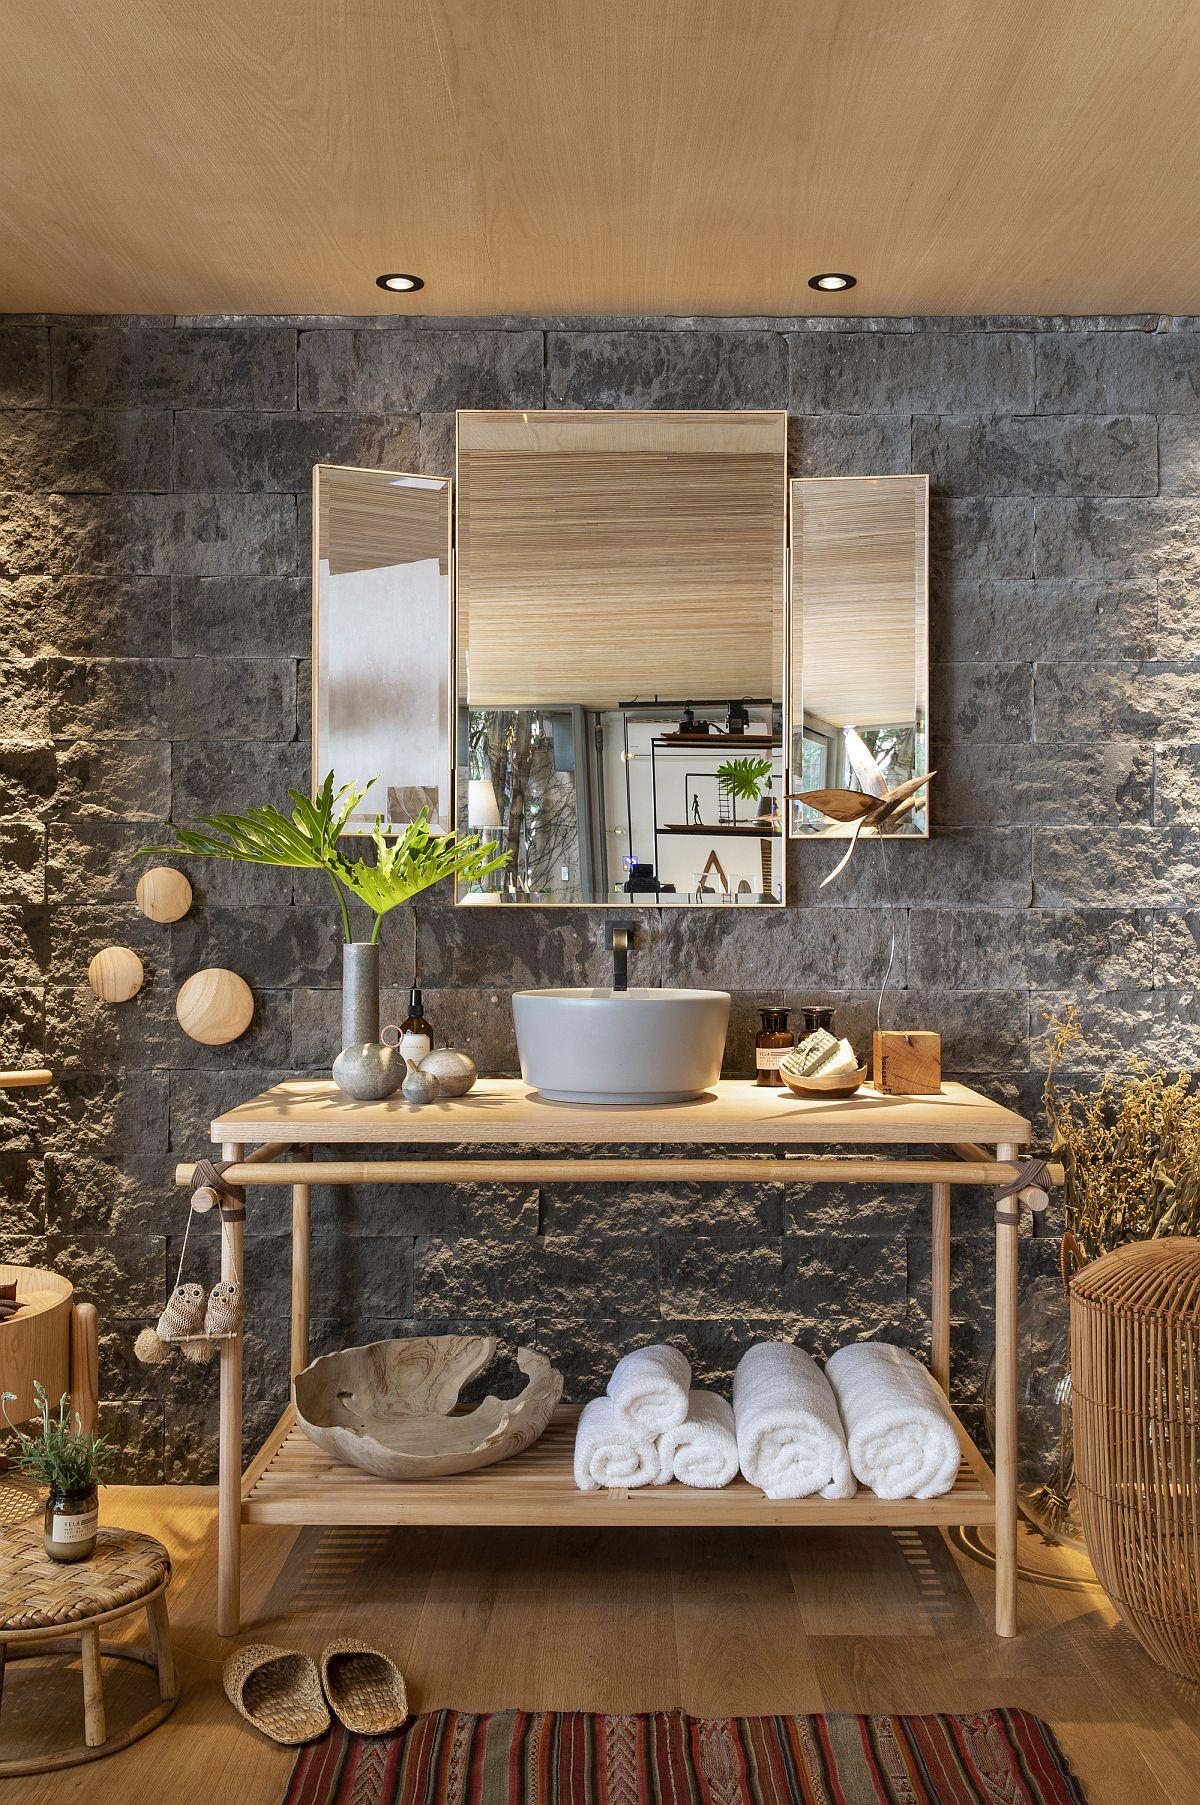 Stone walls fashion a unique backdrop in this smart bathroom